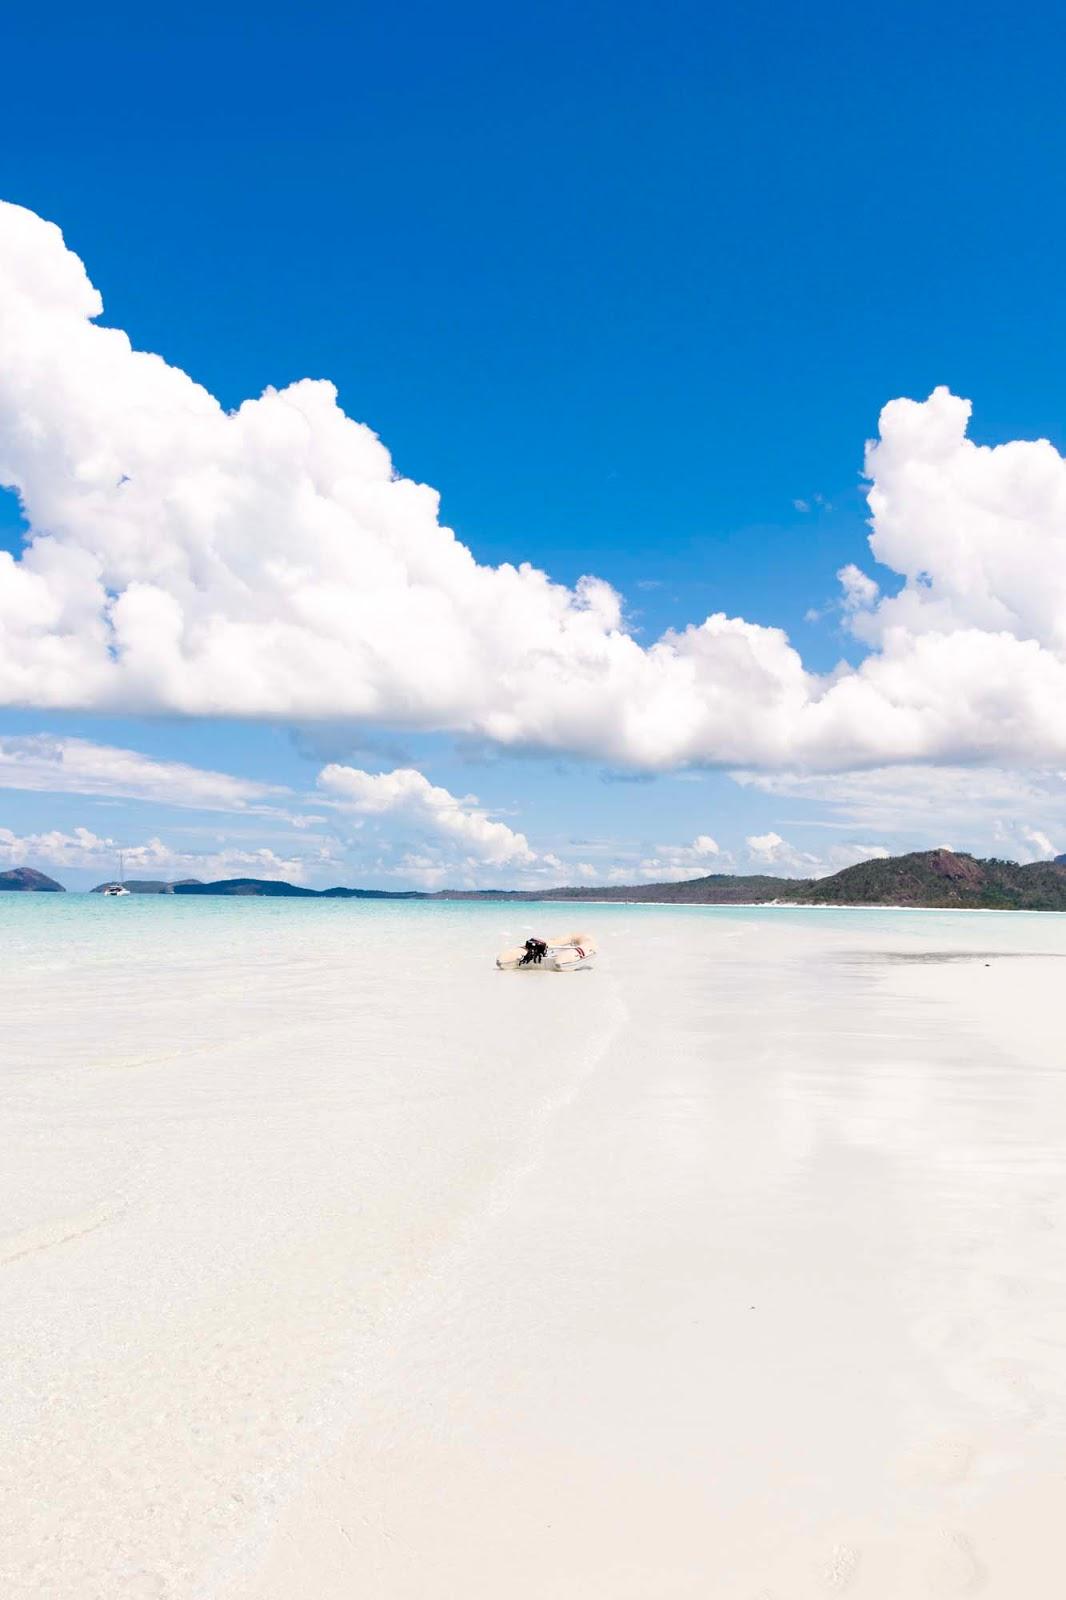 beach in the whitsundays